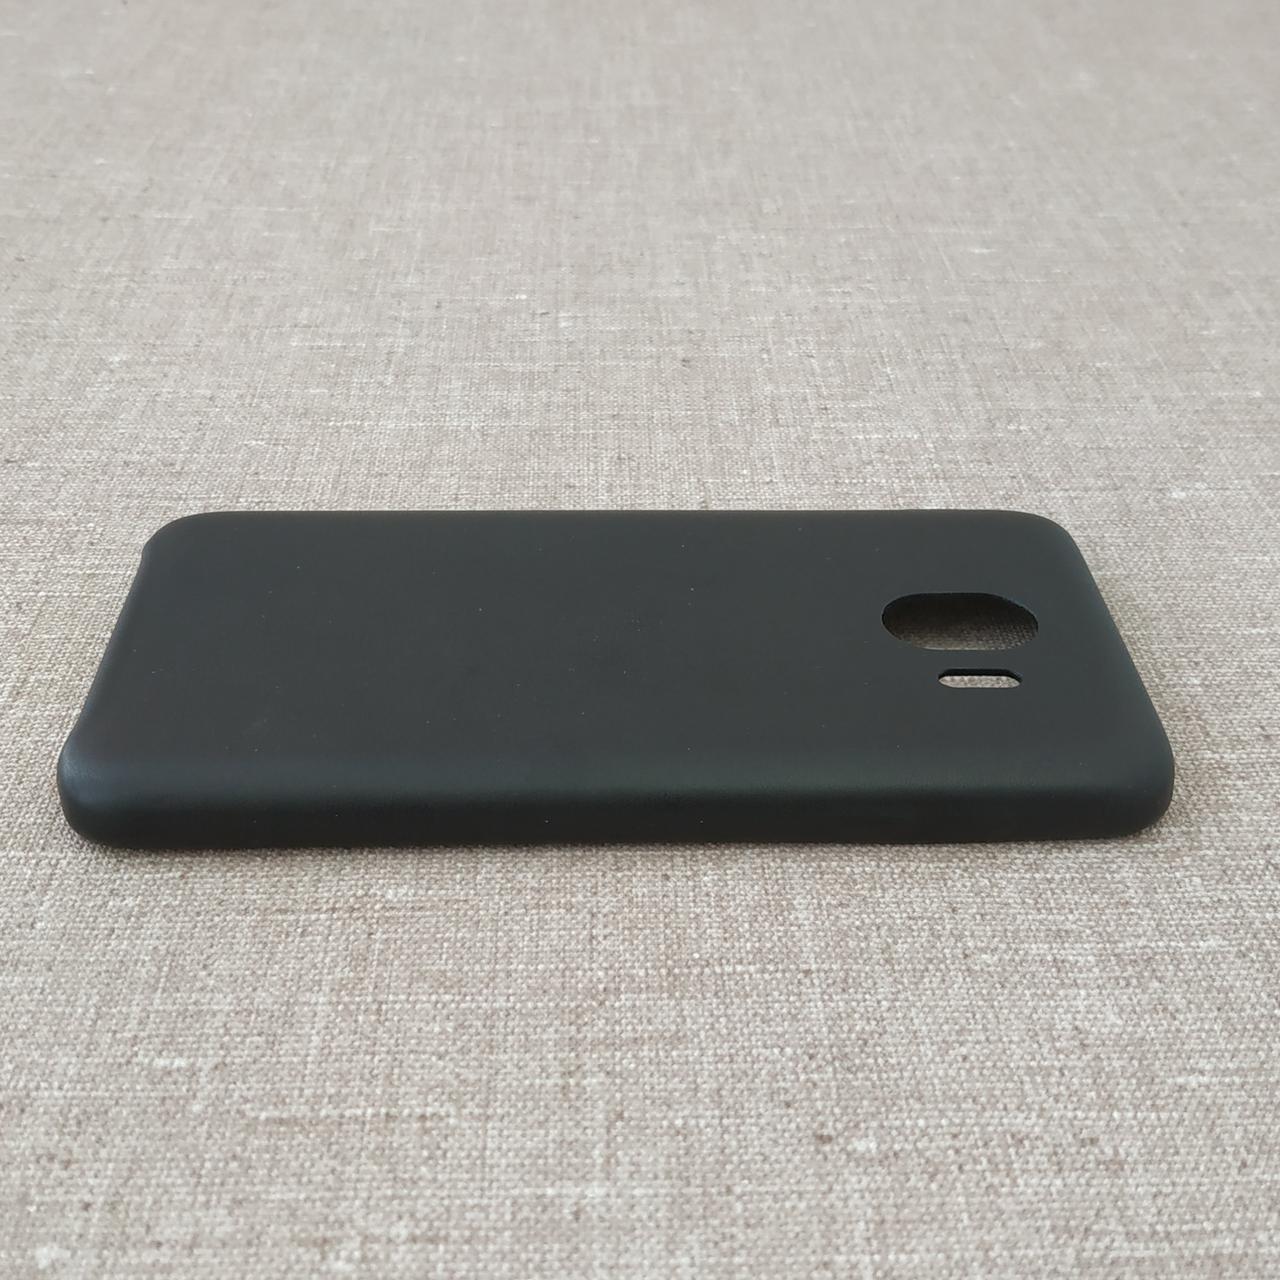 Чехол 2E PU Samsung Galaxy J4 J400 black (J400) 2018 Для телефона